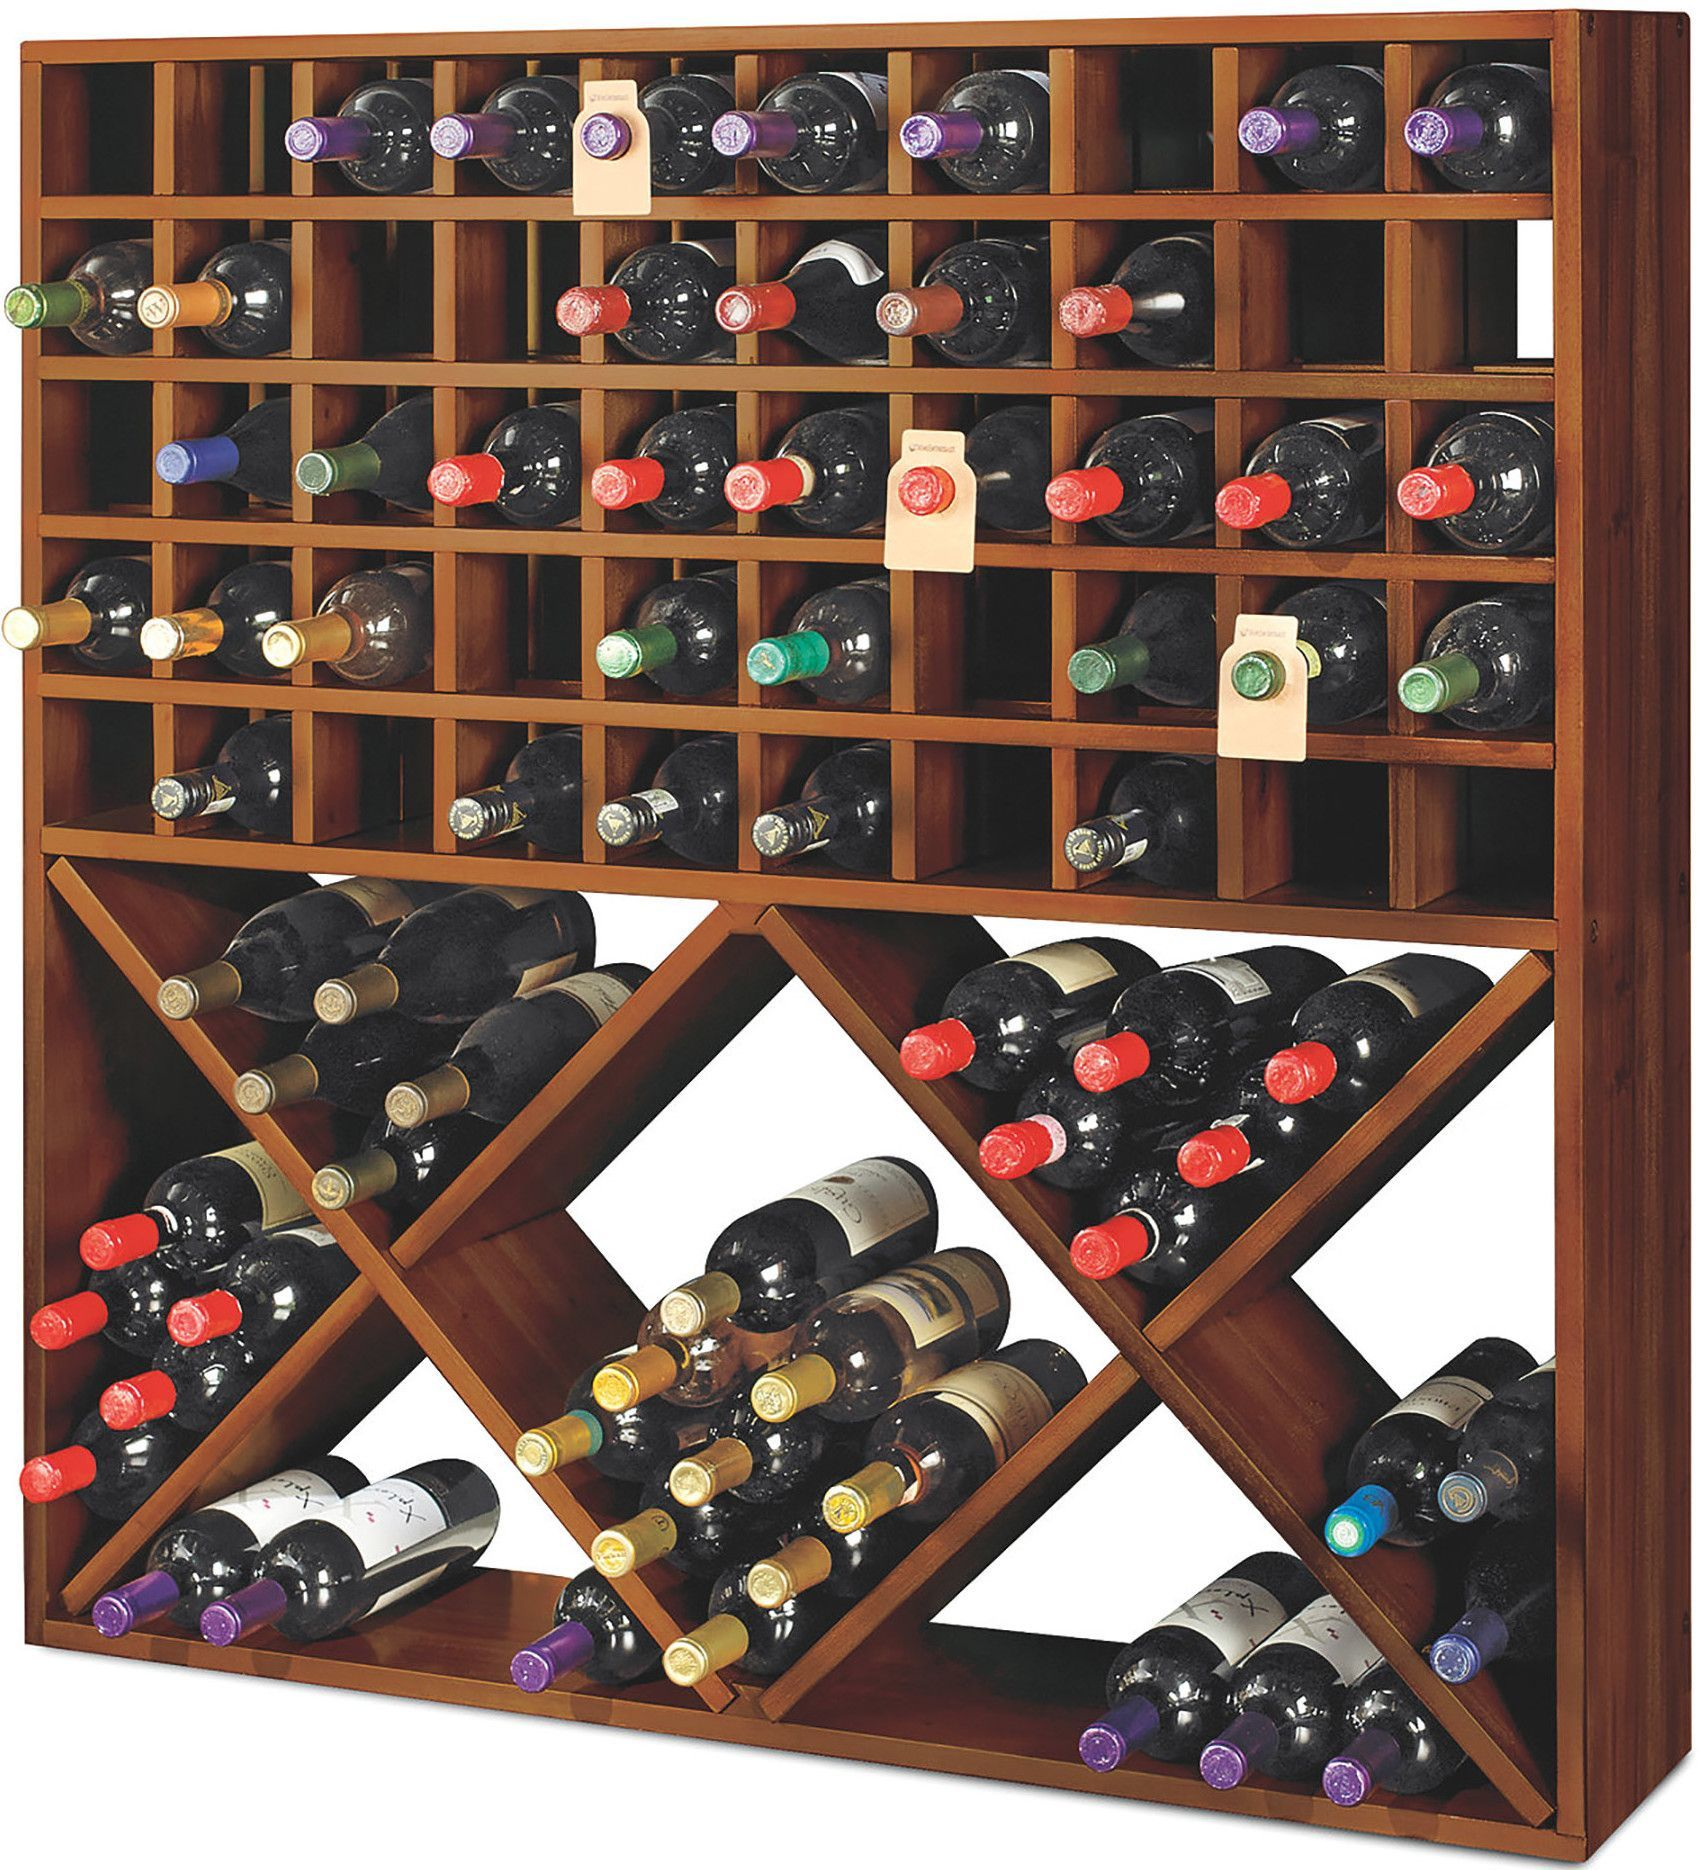 Jumbo Bin Grid 100 Bottle Floor Wine Bottle Rack Wine Rack Wine Bottle Rack Metal Wine Rack